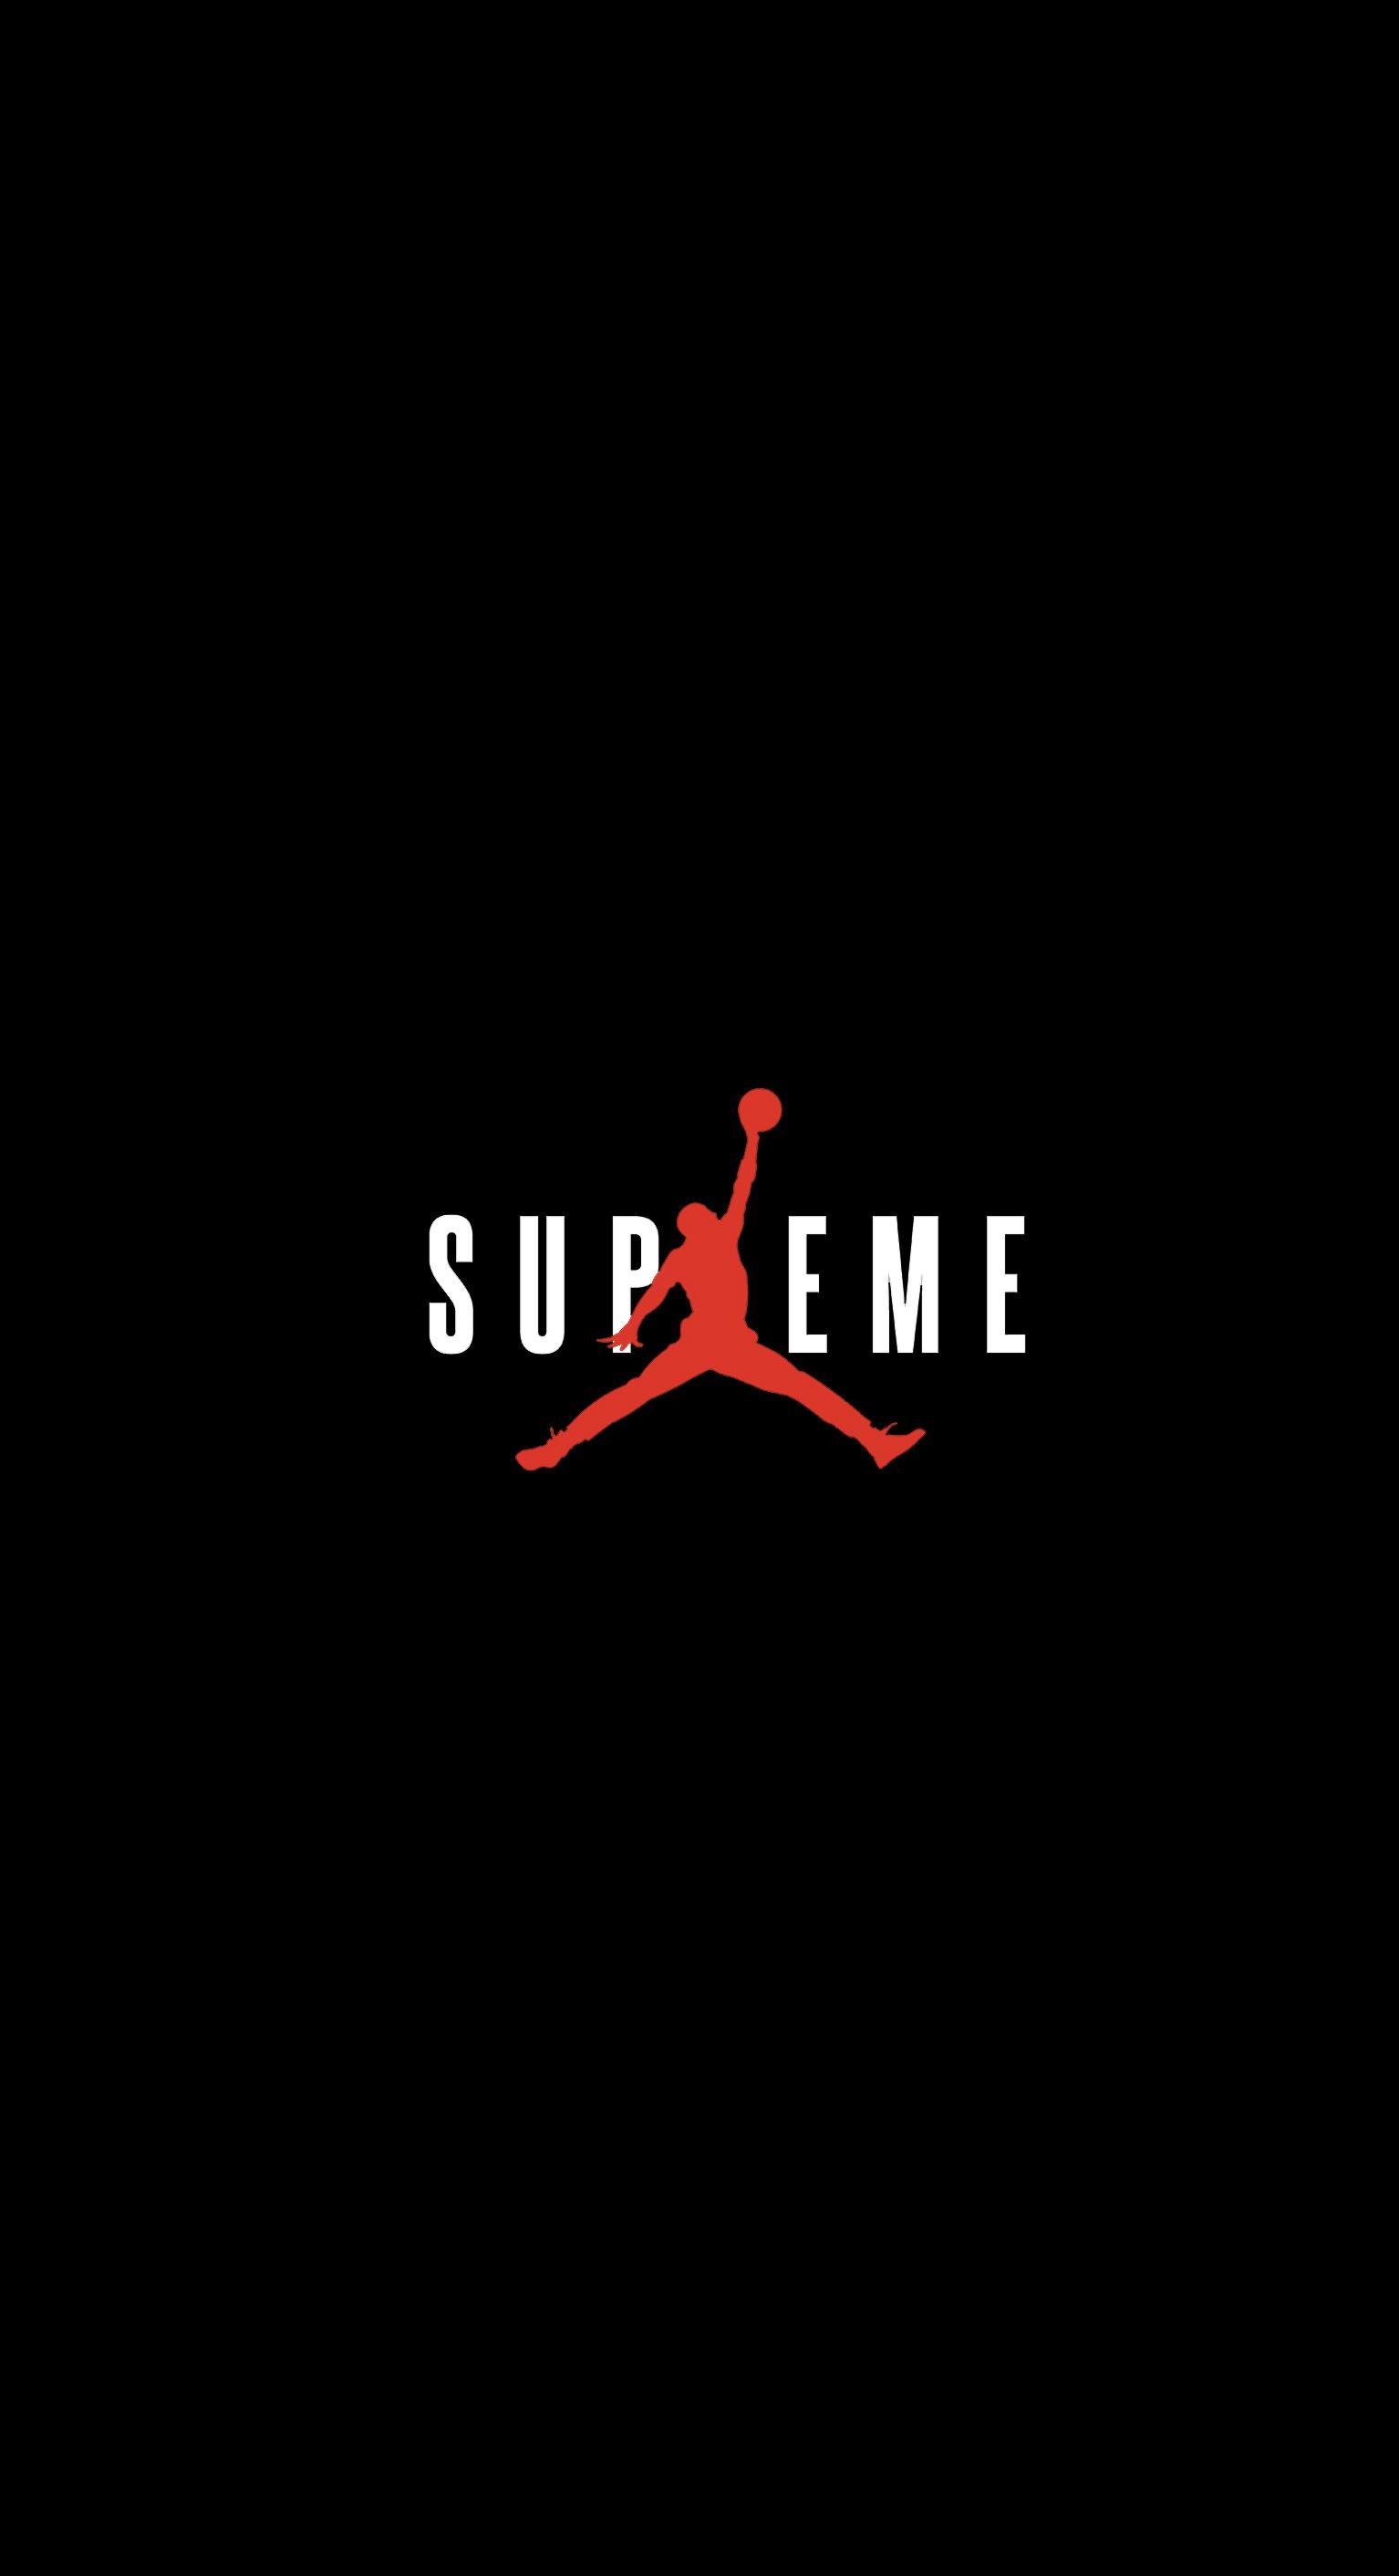 Good Wallpaper Logo Michael Jordan - 58038  Trends_366112.jpg